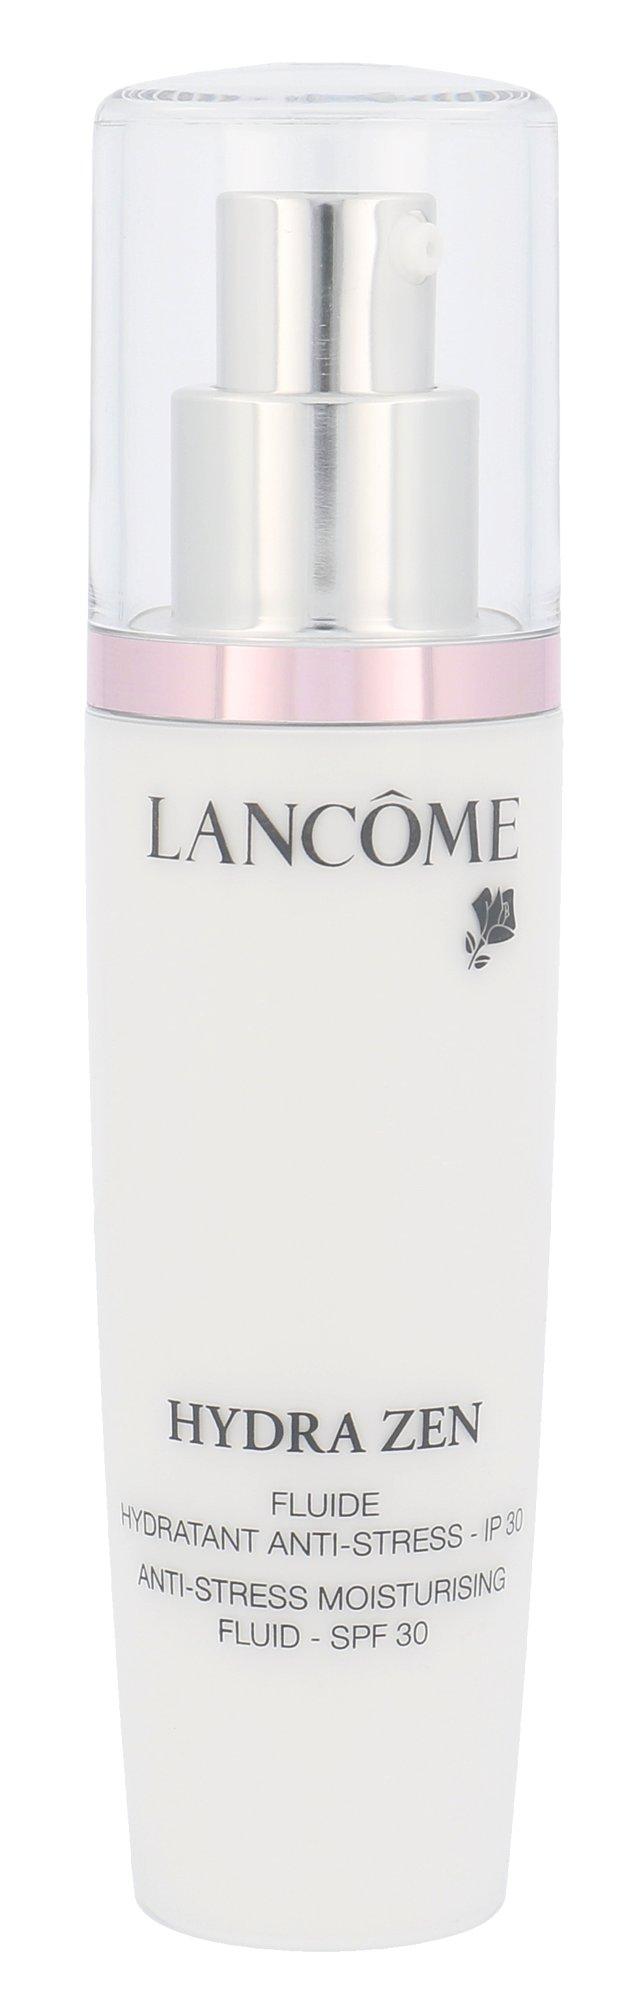 Lancome Hydra Zen Moisturising Cream Fluid (SPF 30) 50 ml